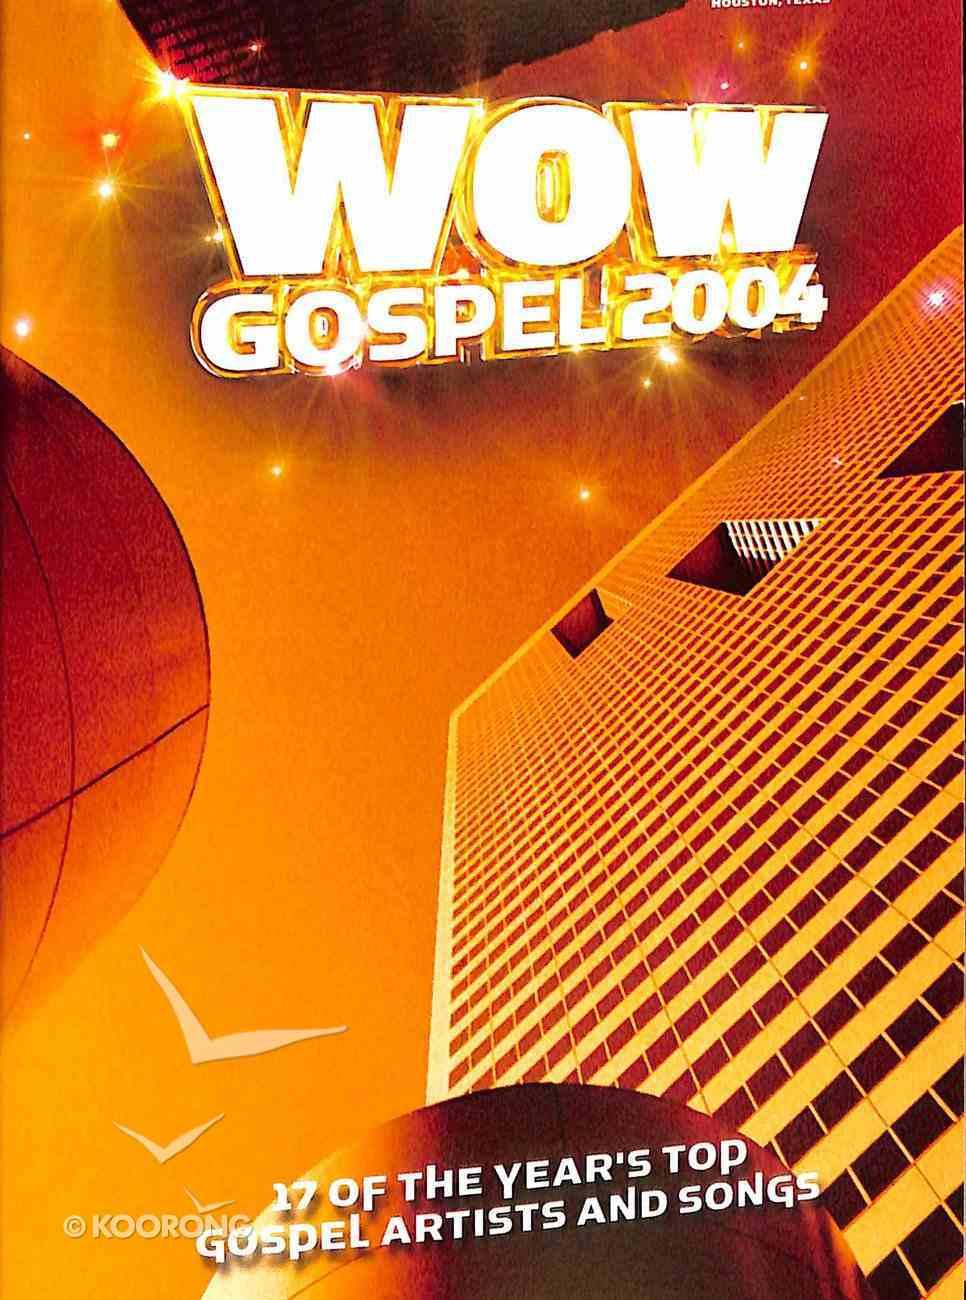 Wow Gospel 2004 DVD